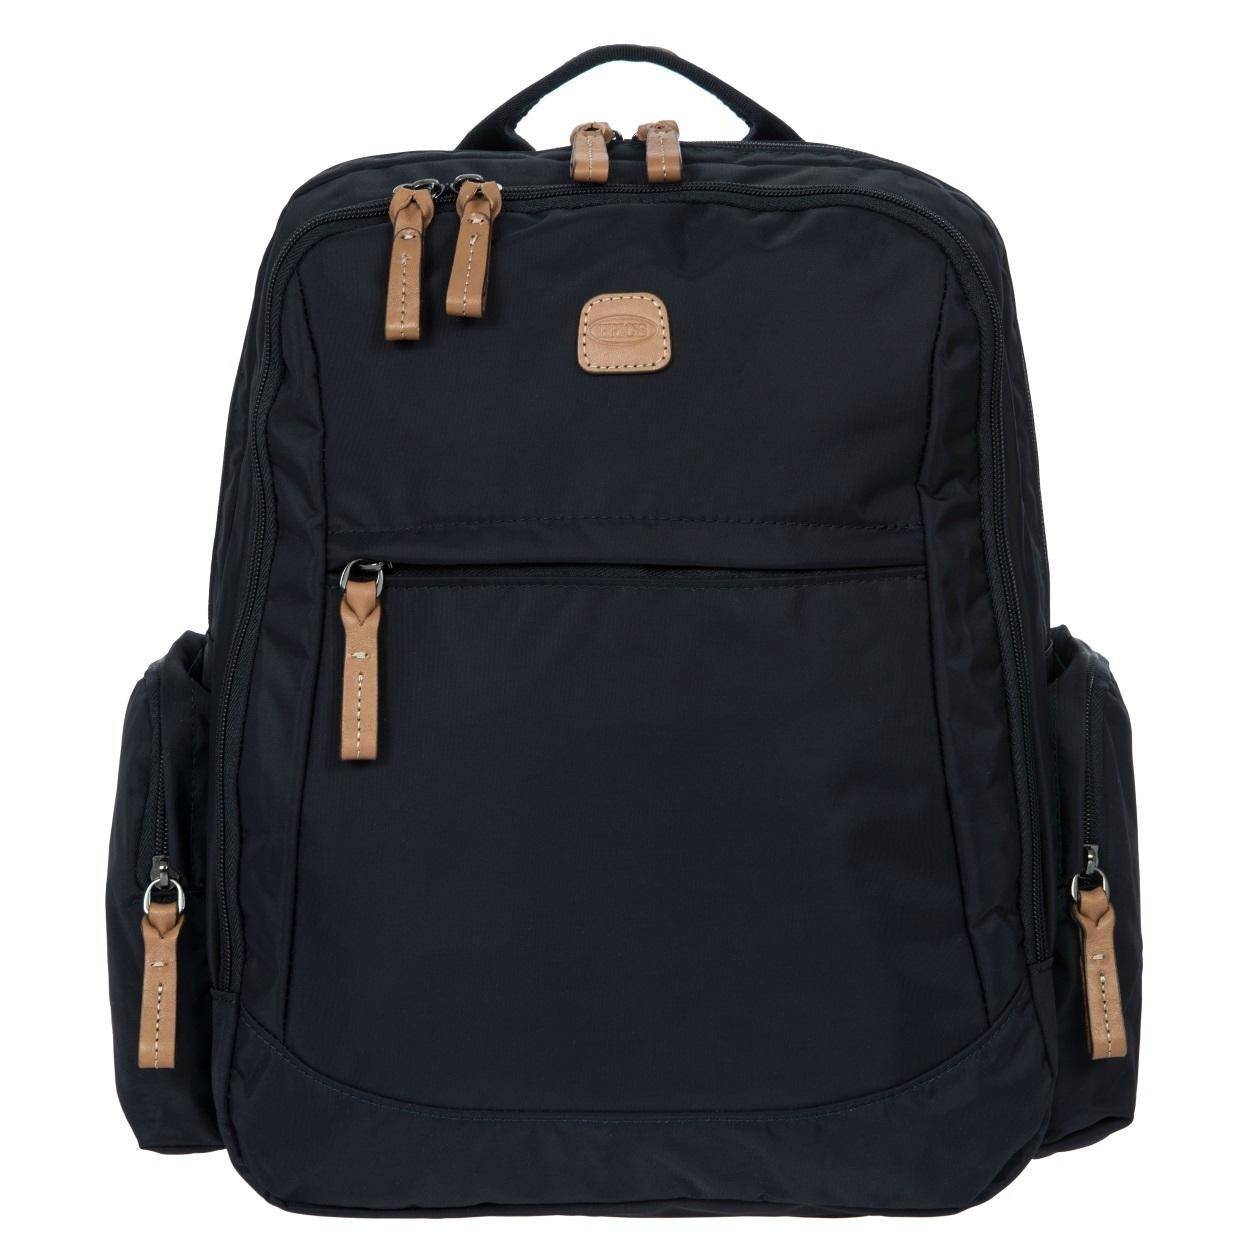 Bric's X-Bag/x-Travel 2.0 Nomad Laptop|Tablet Business Backpack, Black/Black, One Size